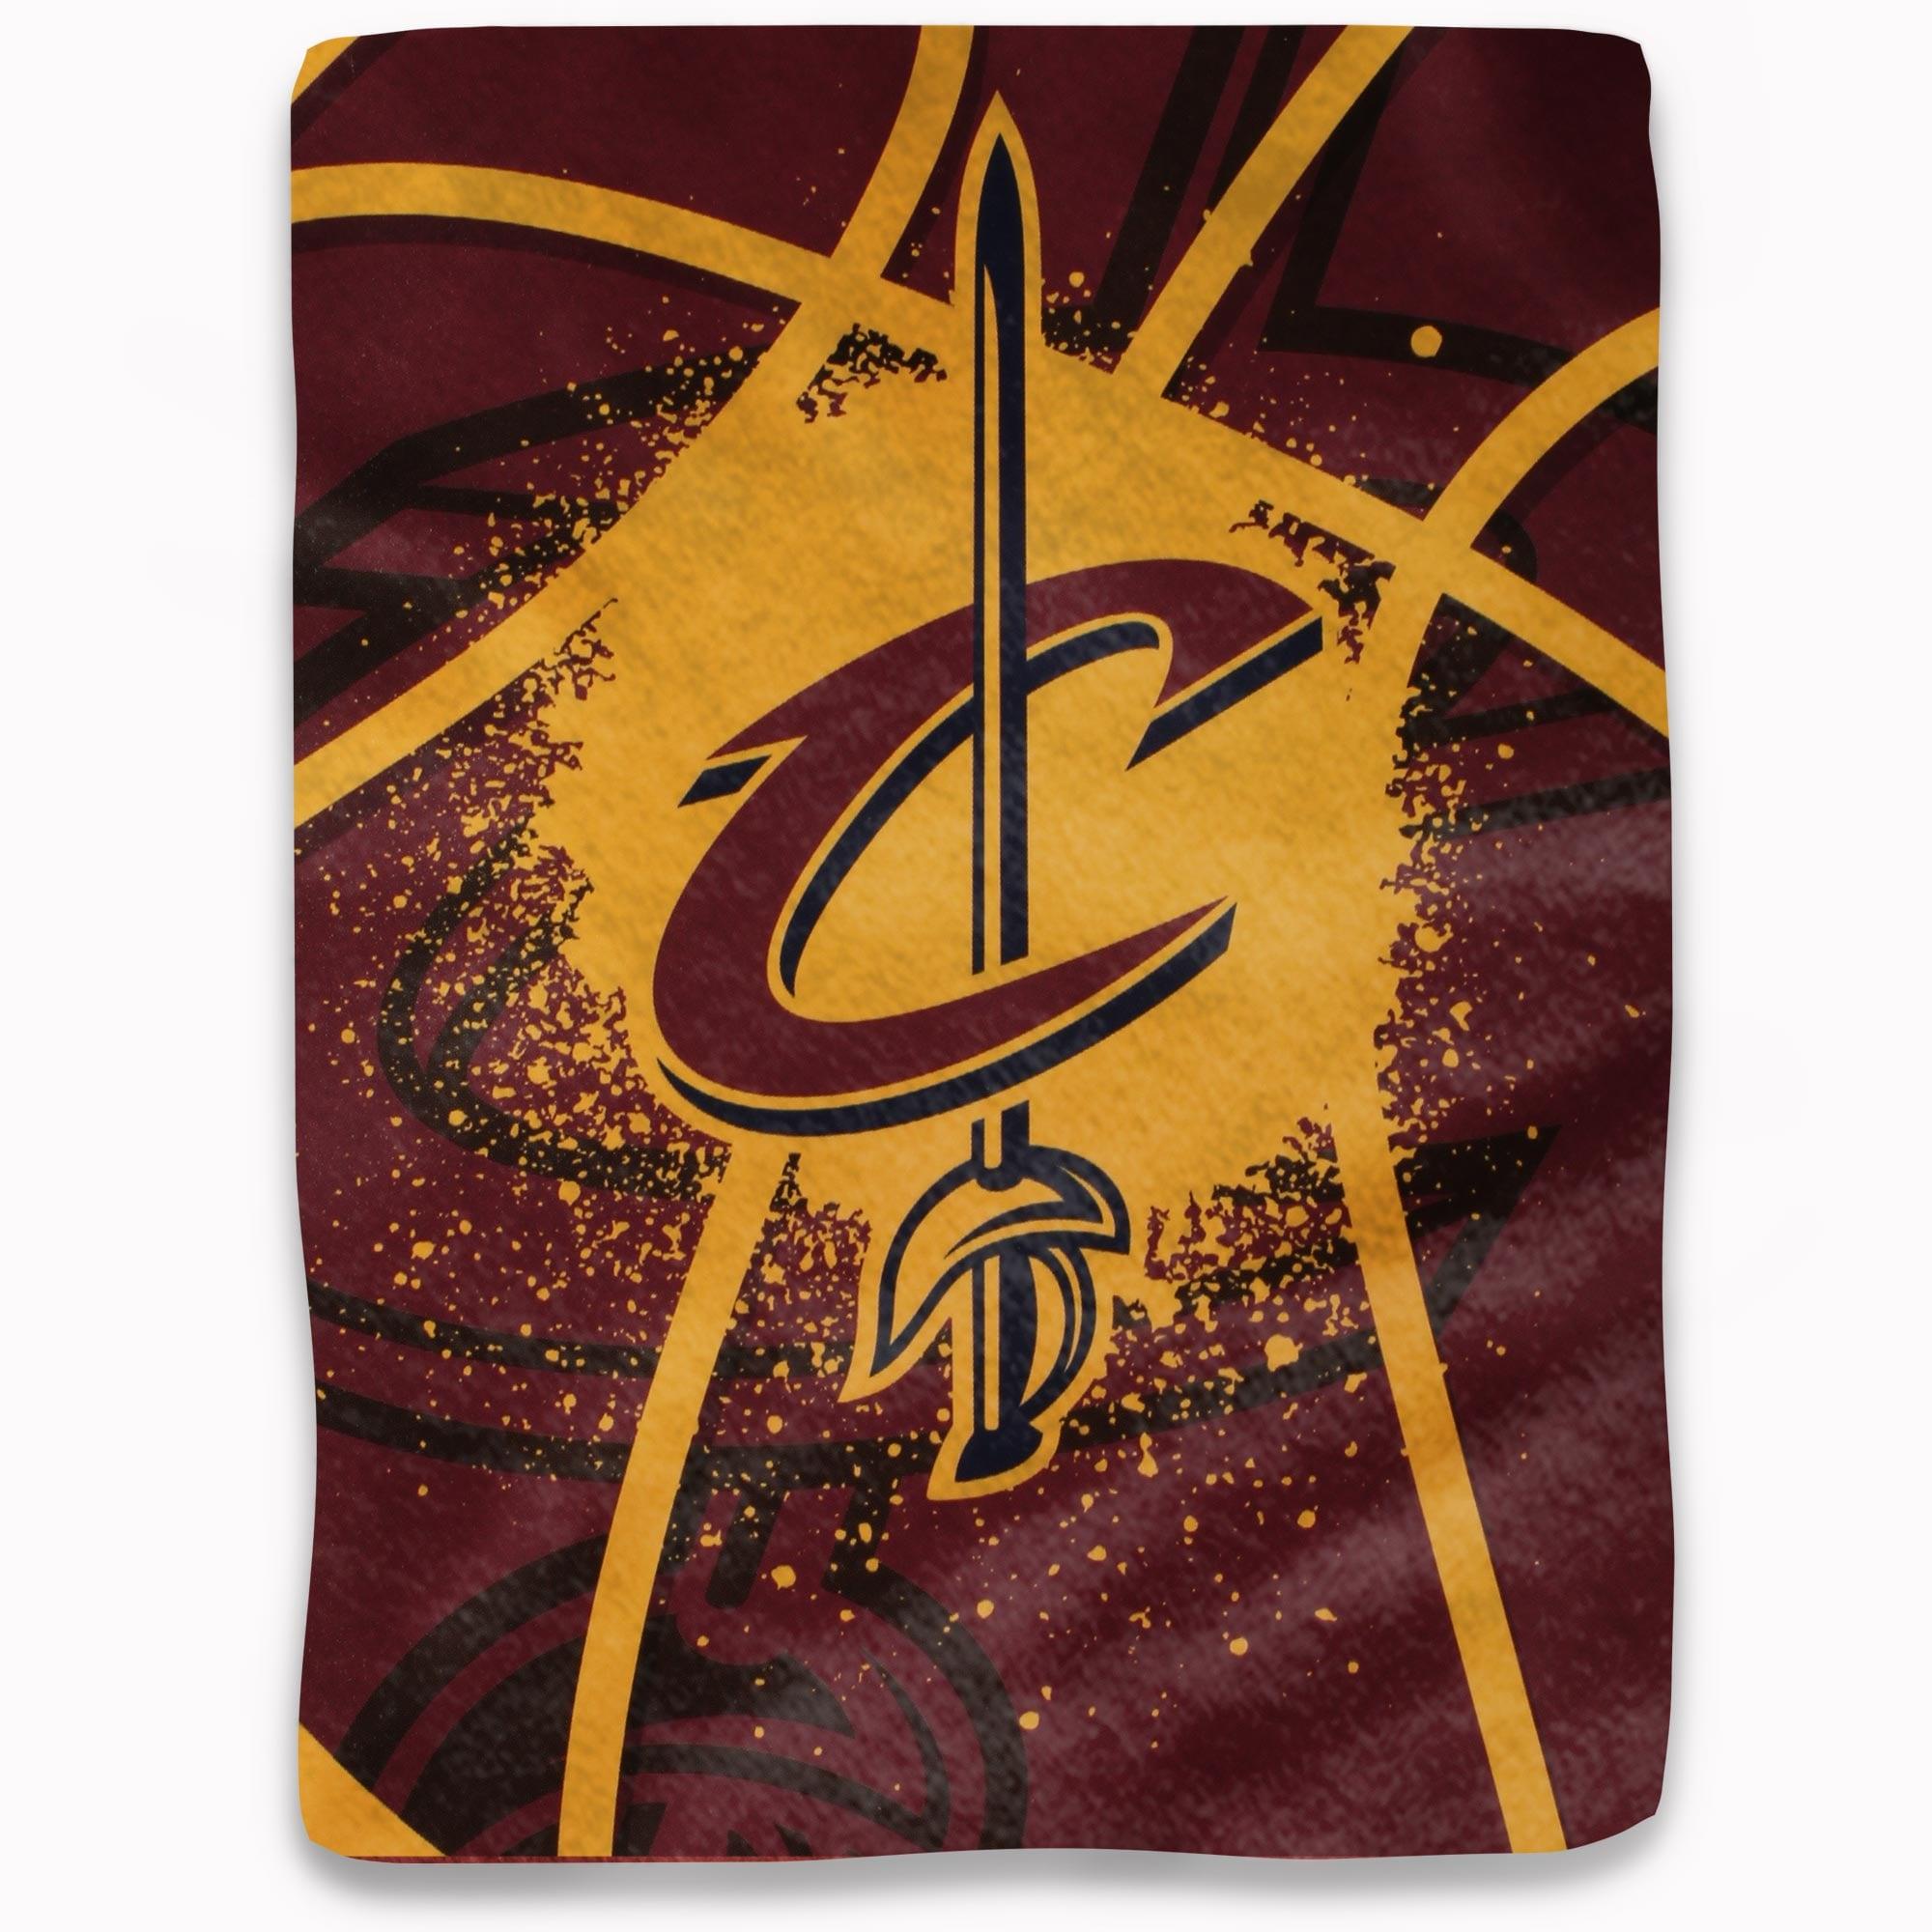 "Cleveland Cavaliers Shadow Play 60"" x 80"" Plush Blanket"